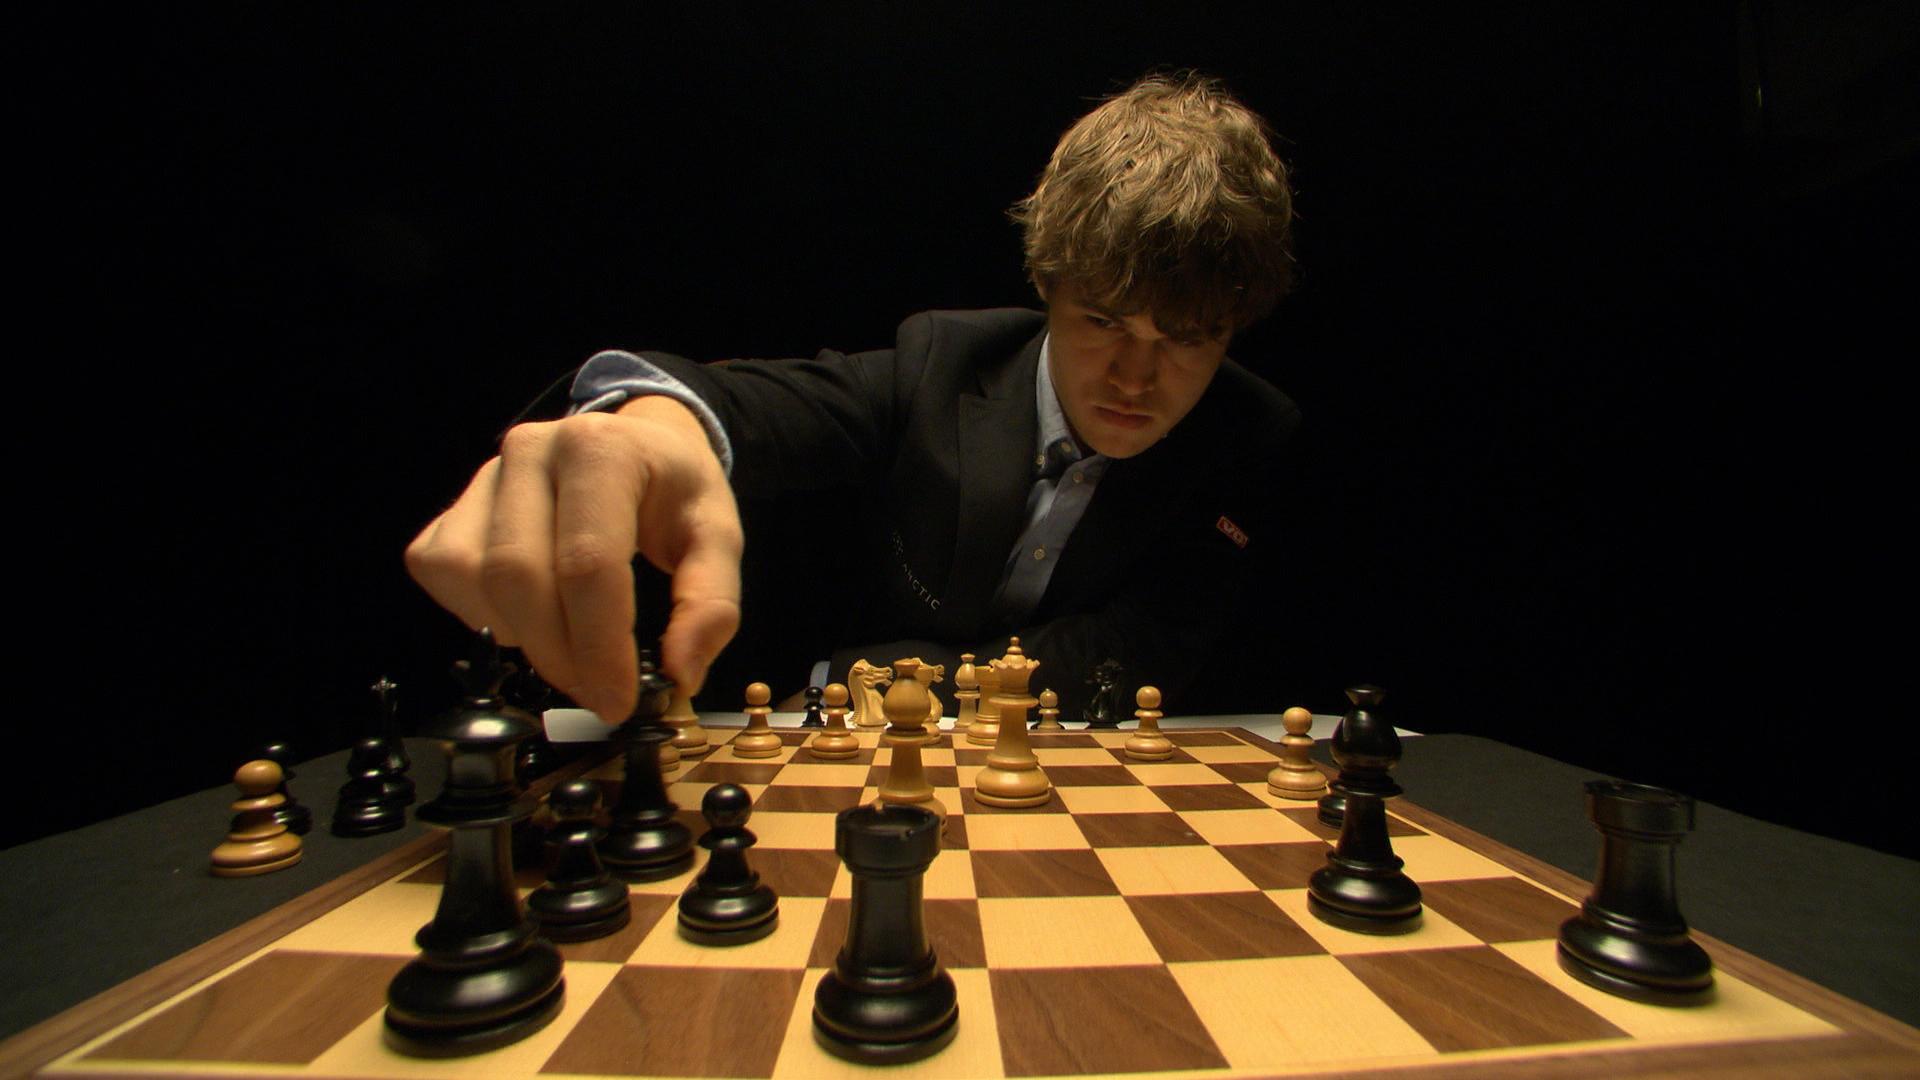 World S No 1 Chess Player Magnus Carlsen Holds Title Cbs News